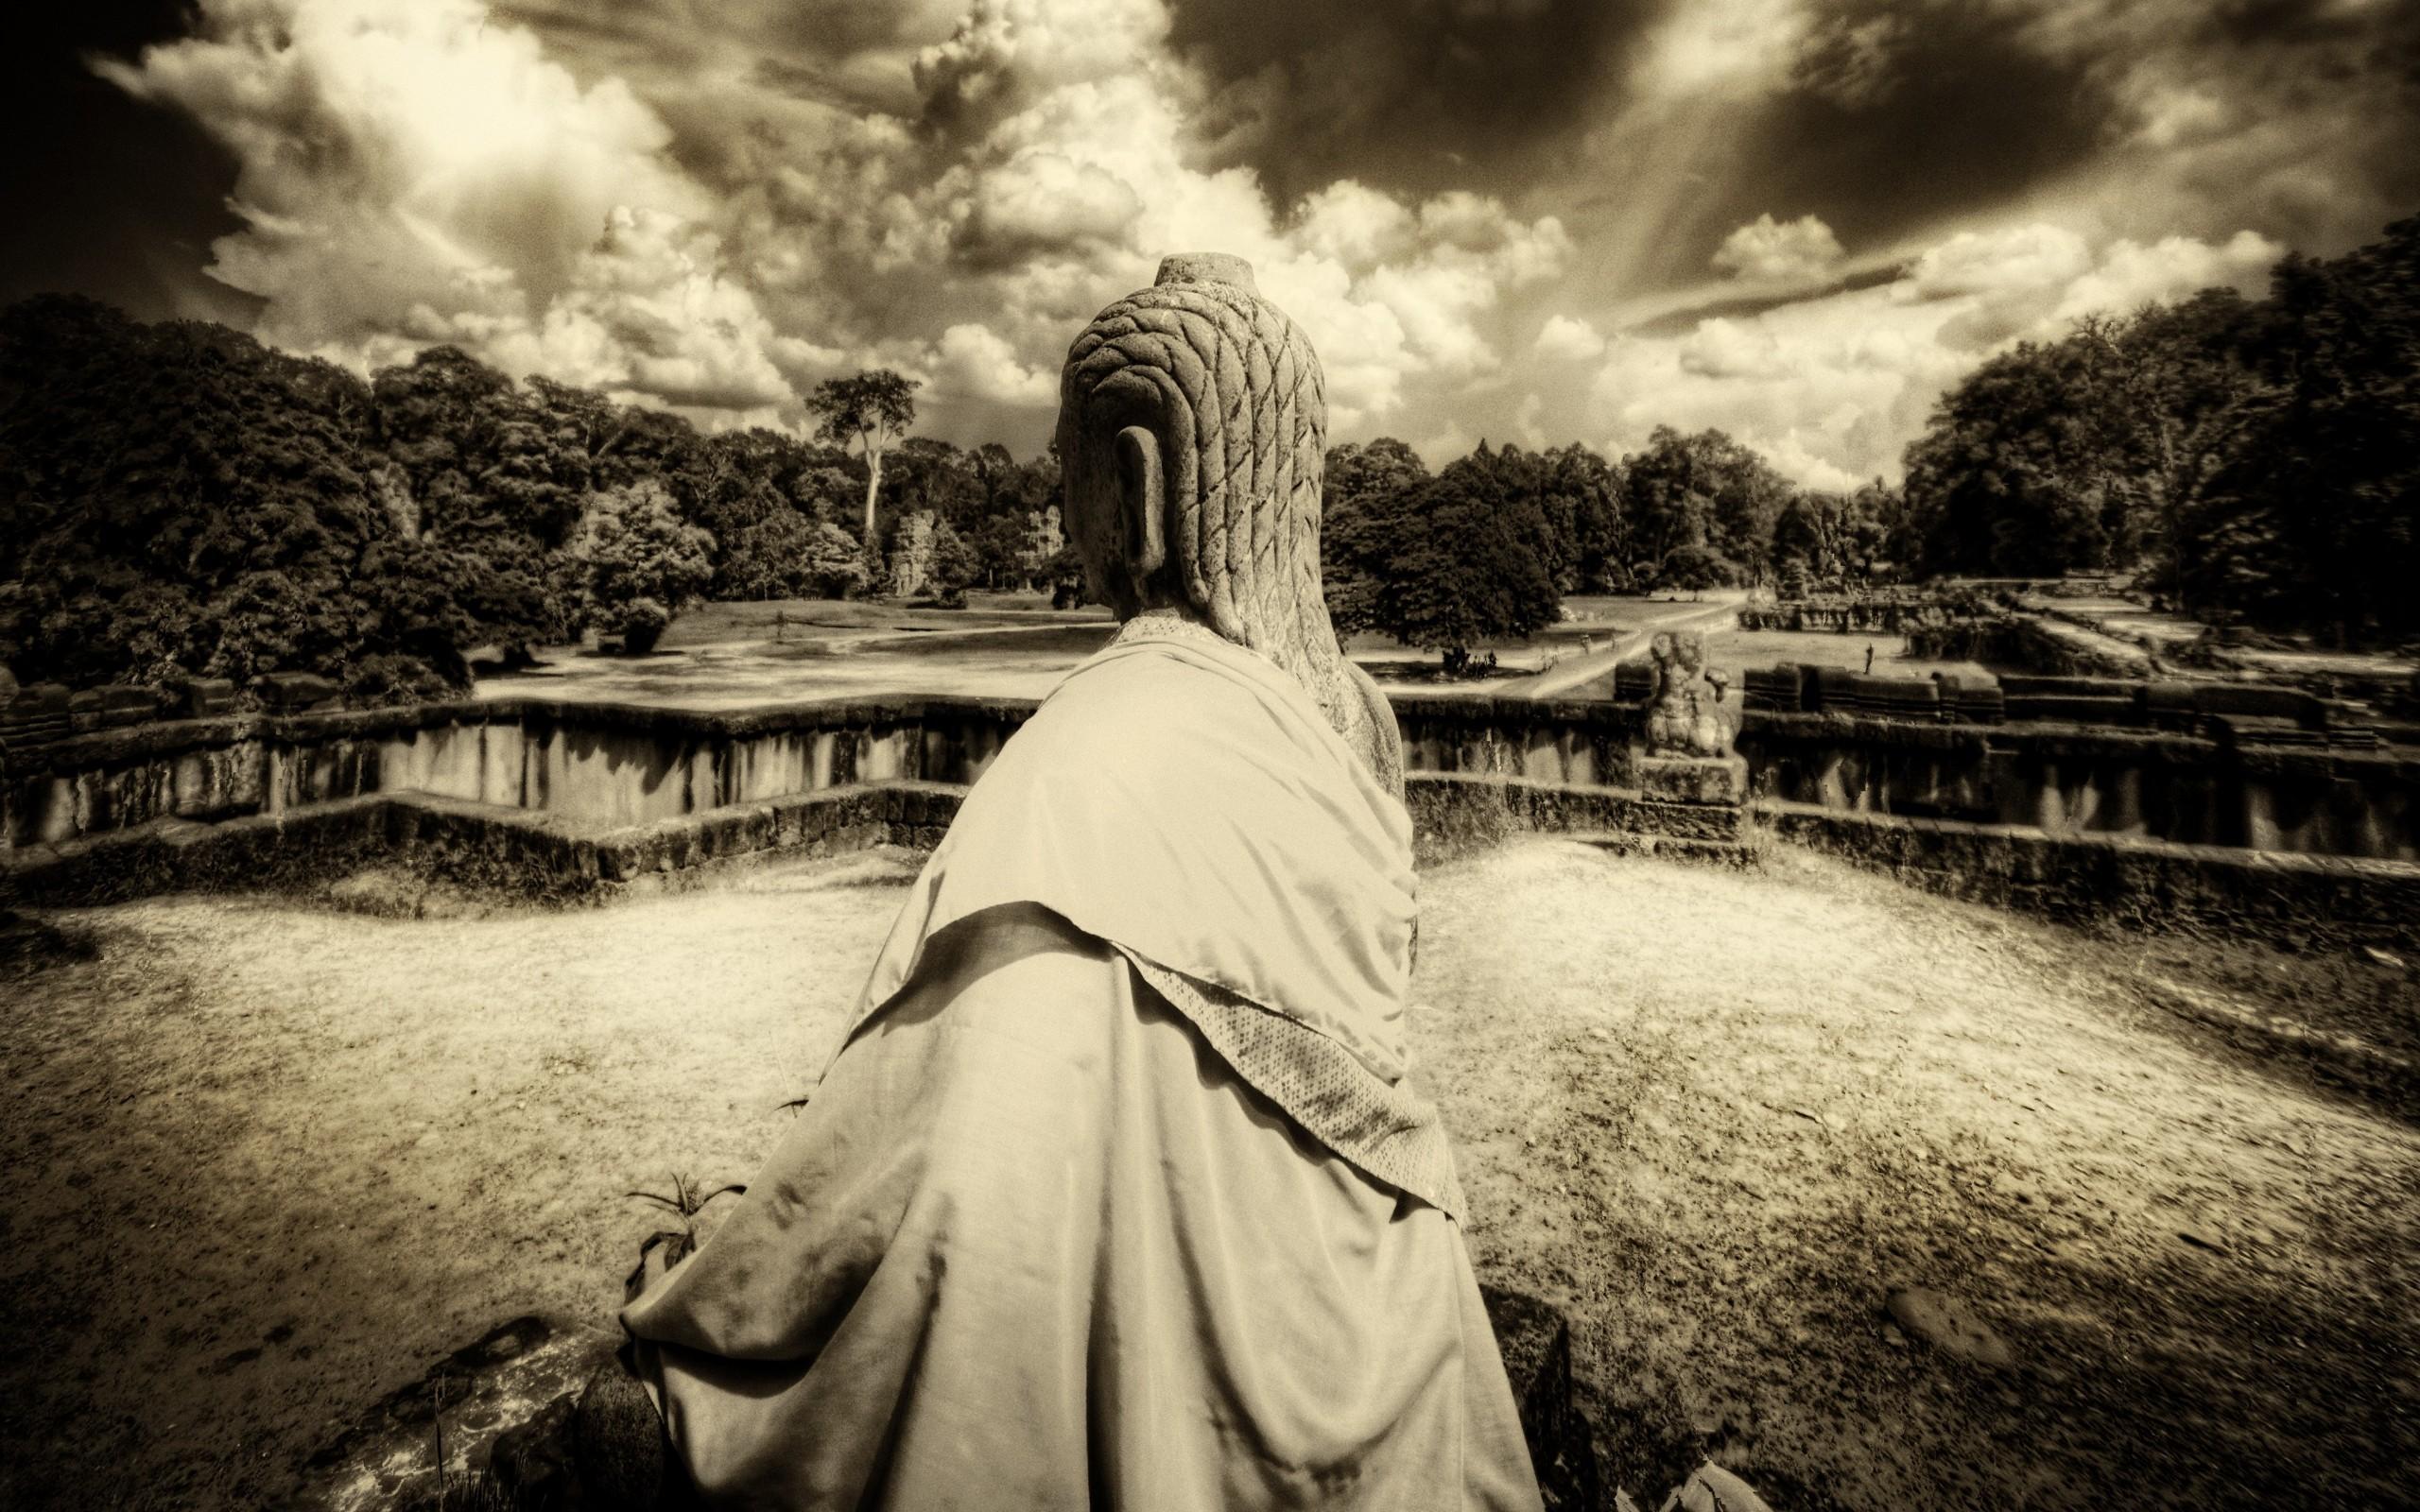 Buddha Quotes Desktop Wallpaper Meditation Wallpaper 183 ① Download Free Beautiful Wallpapers